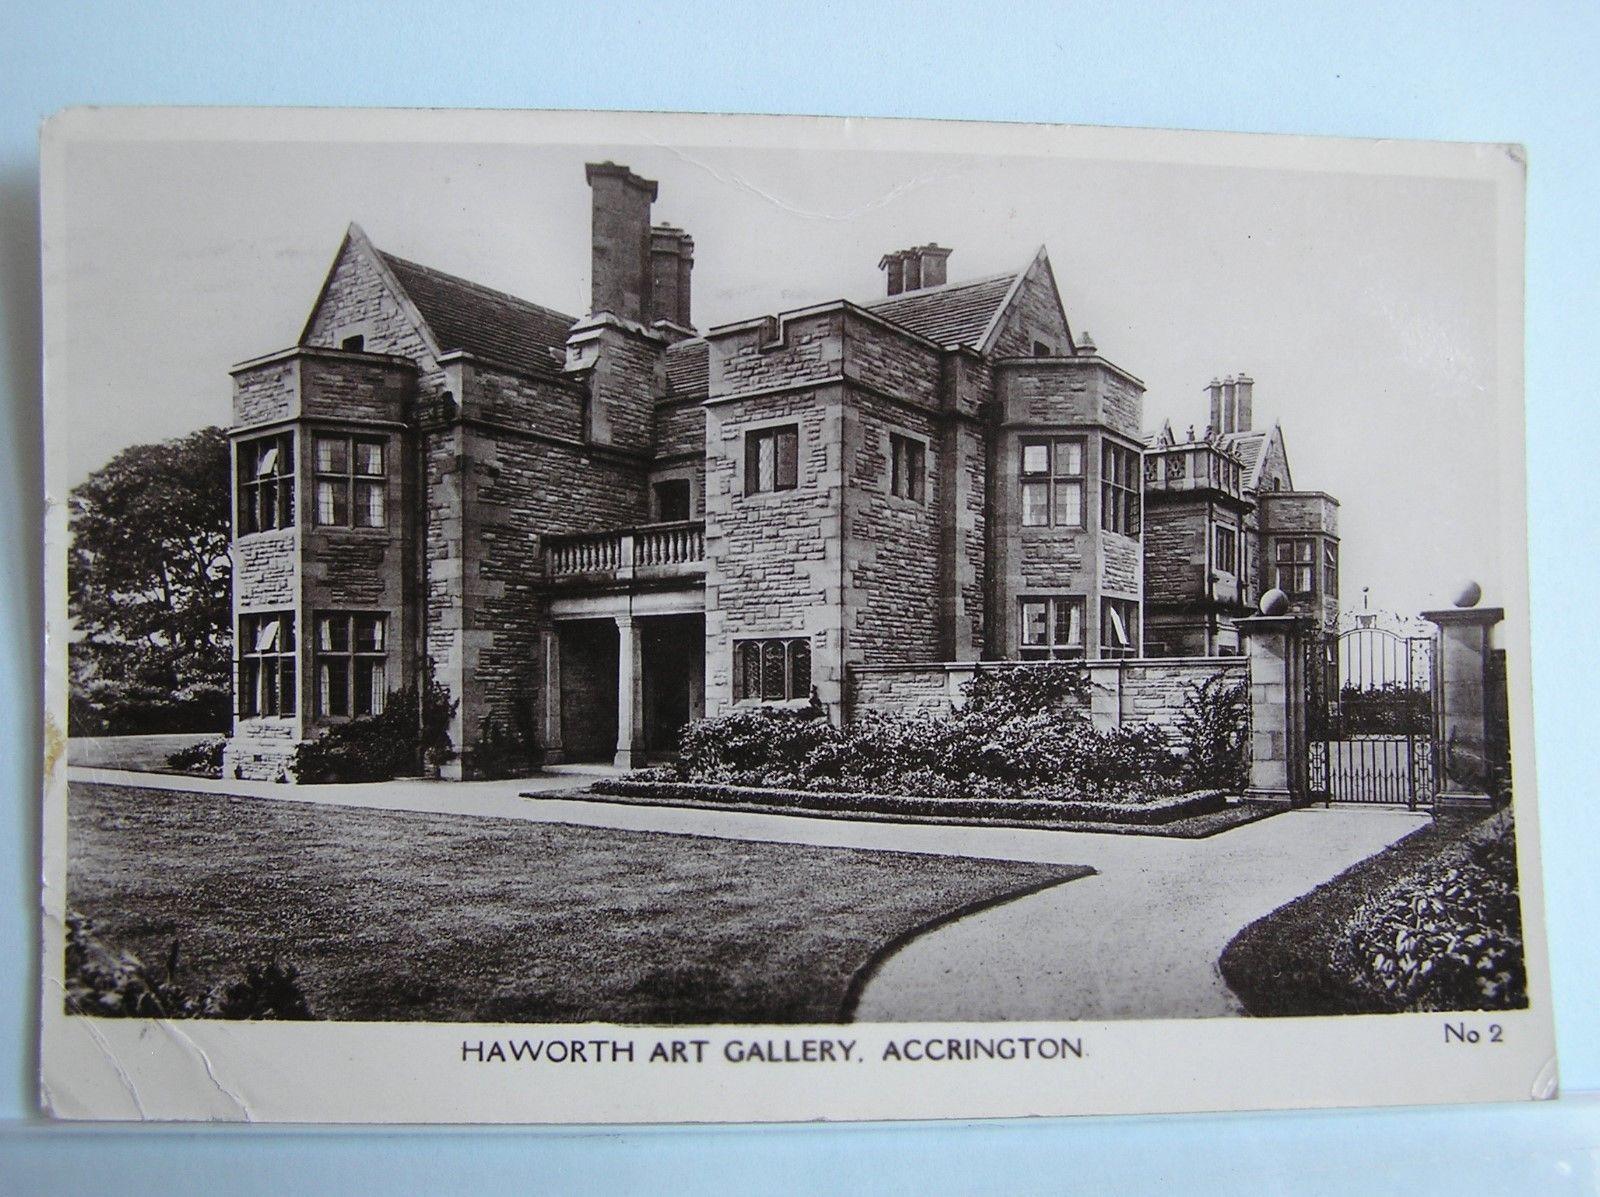 R/P POSTCARD ACCRINGTON HAWORTH ART GALLERY